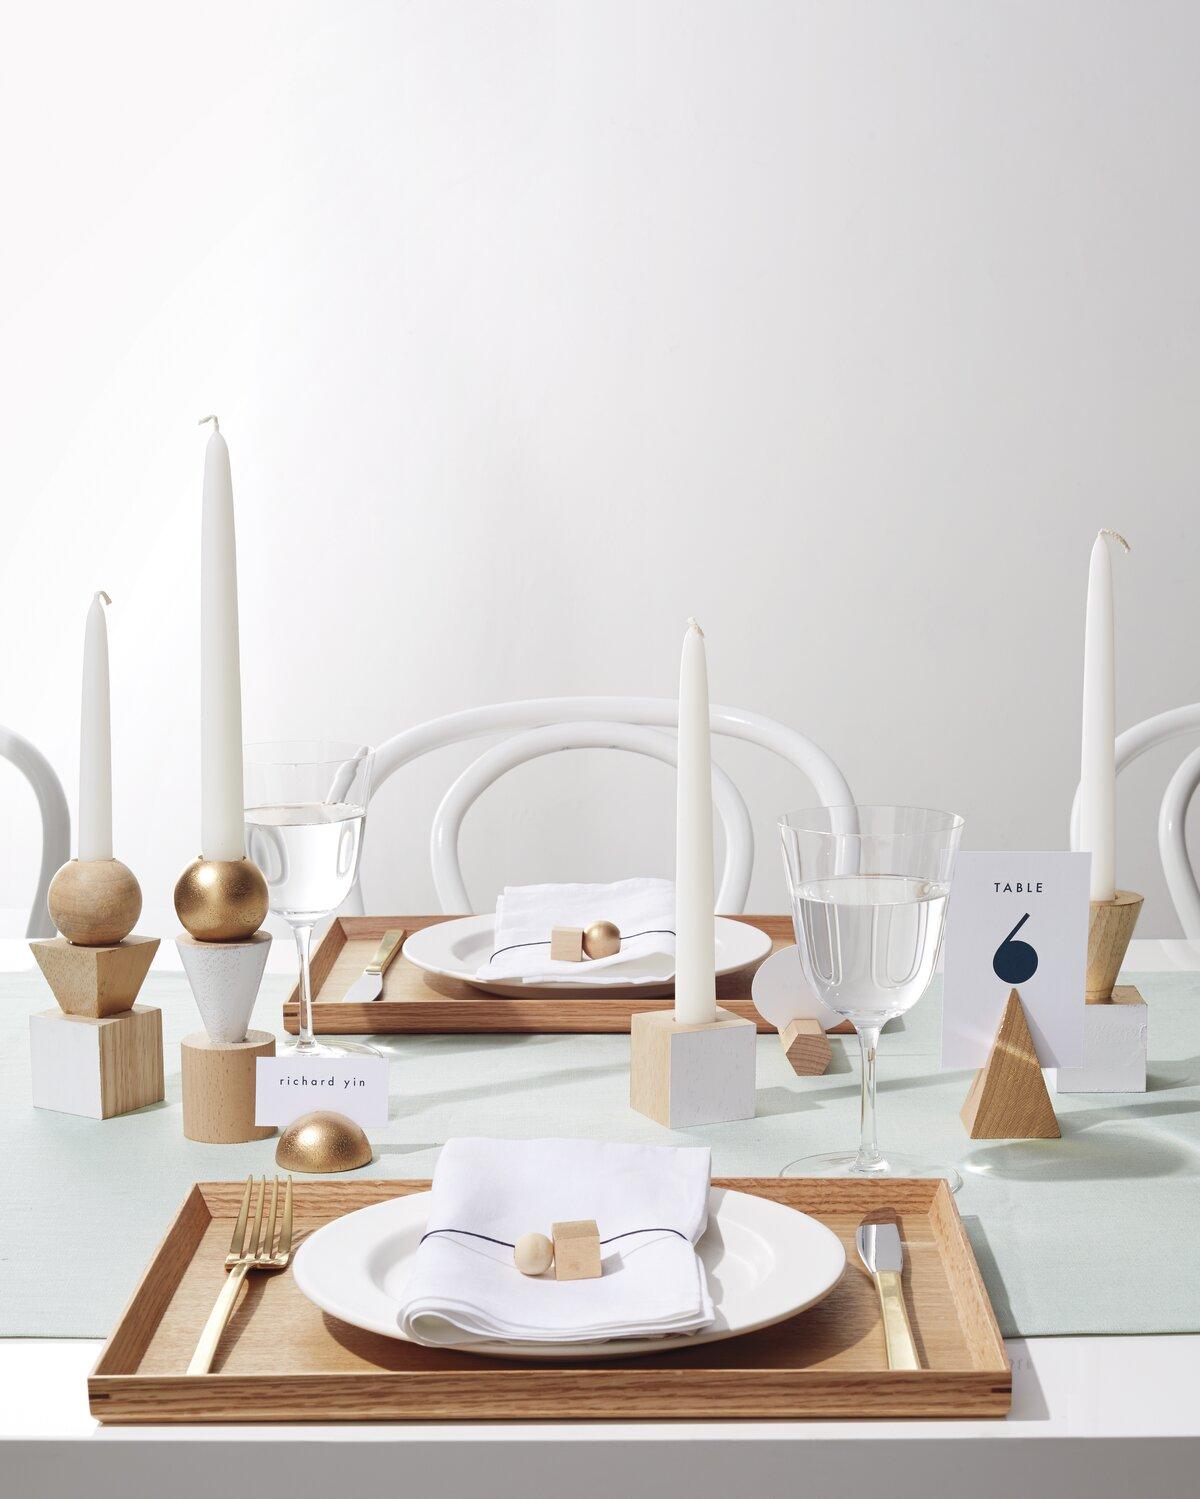 Geometric Candle Sticks